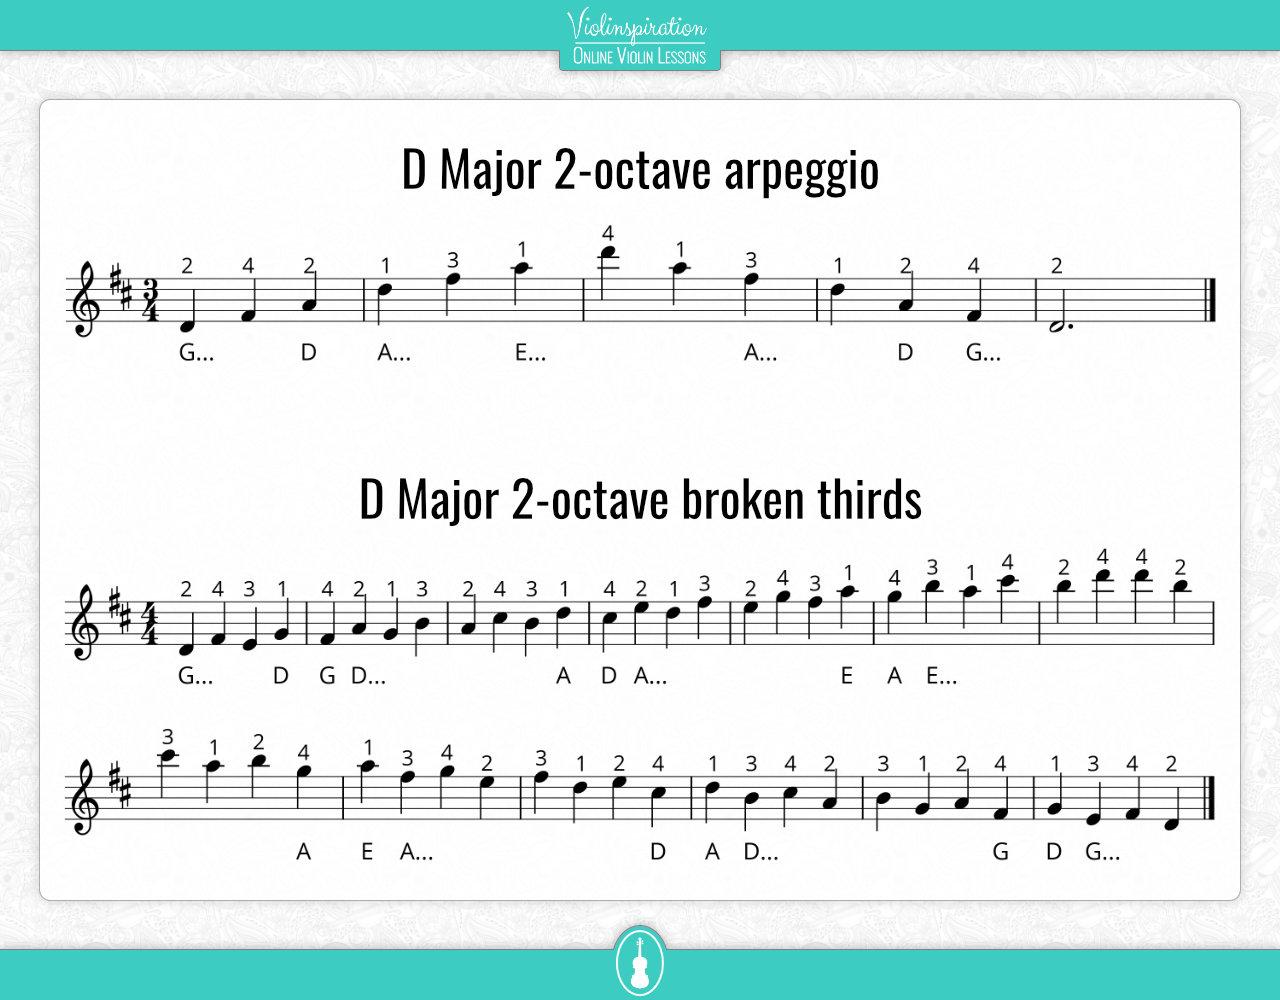 Third Position Exercise - D Major 2-octave arpeggio + broken thirds